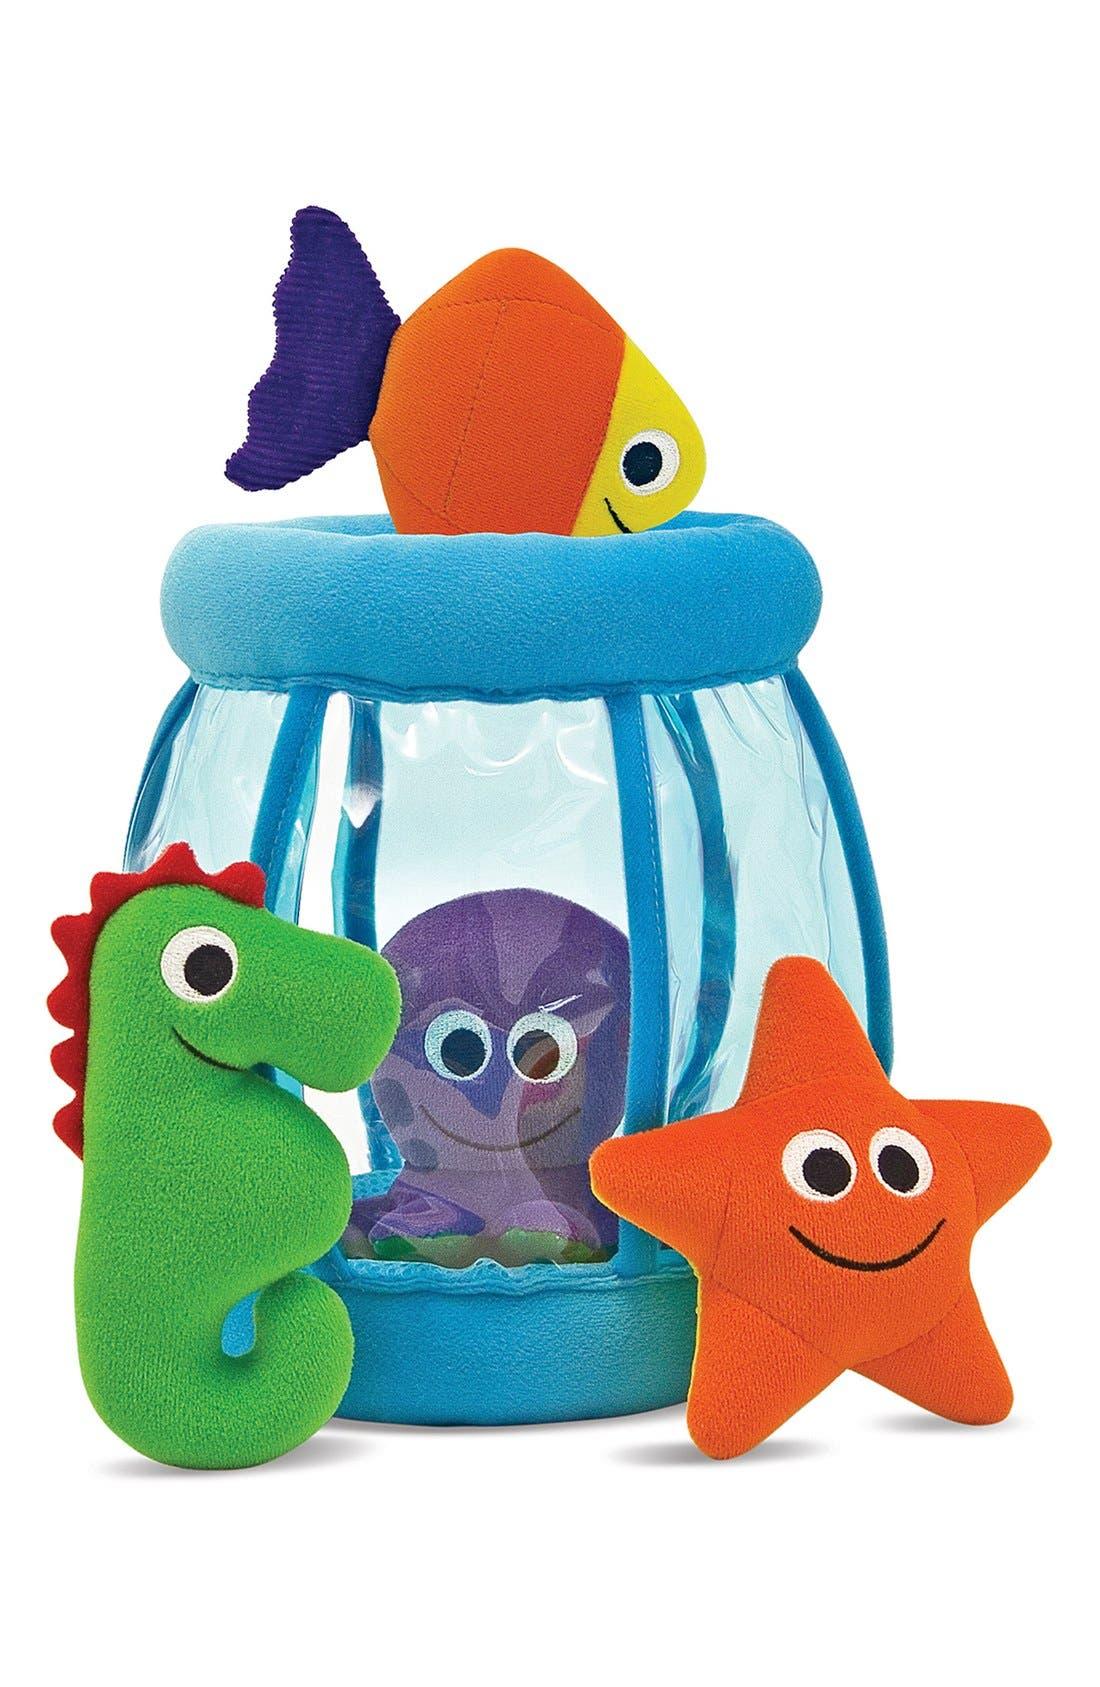 'Fishbowl Fill & Spill' Game,                             Main thumbnail 1, color,                             MULTI